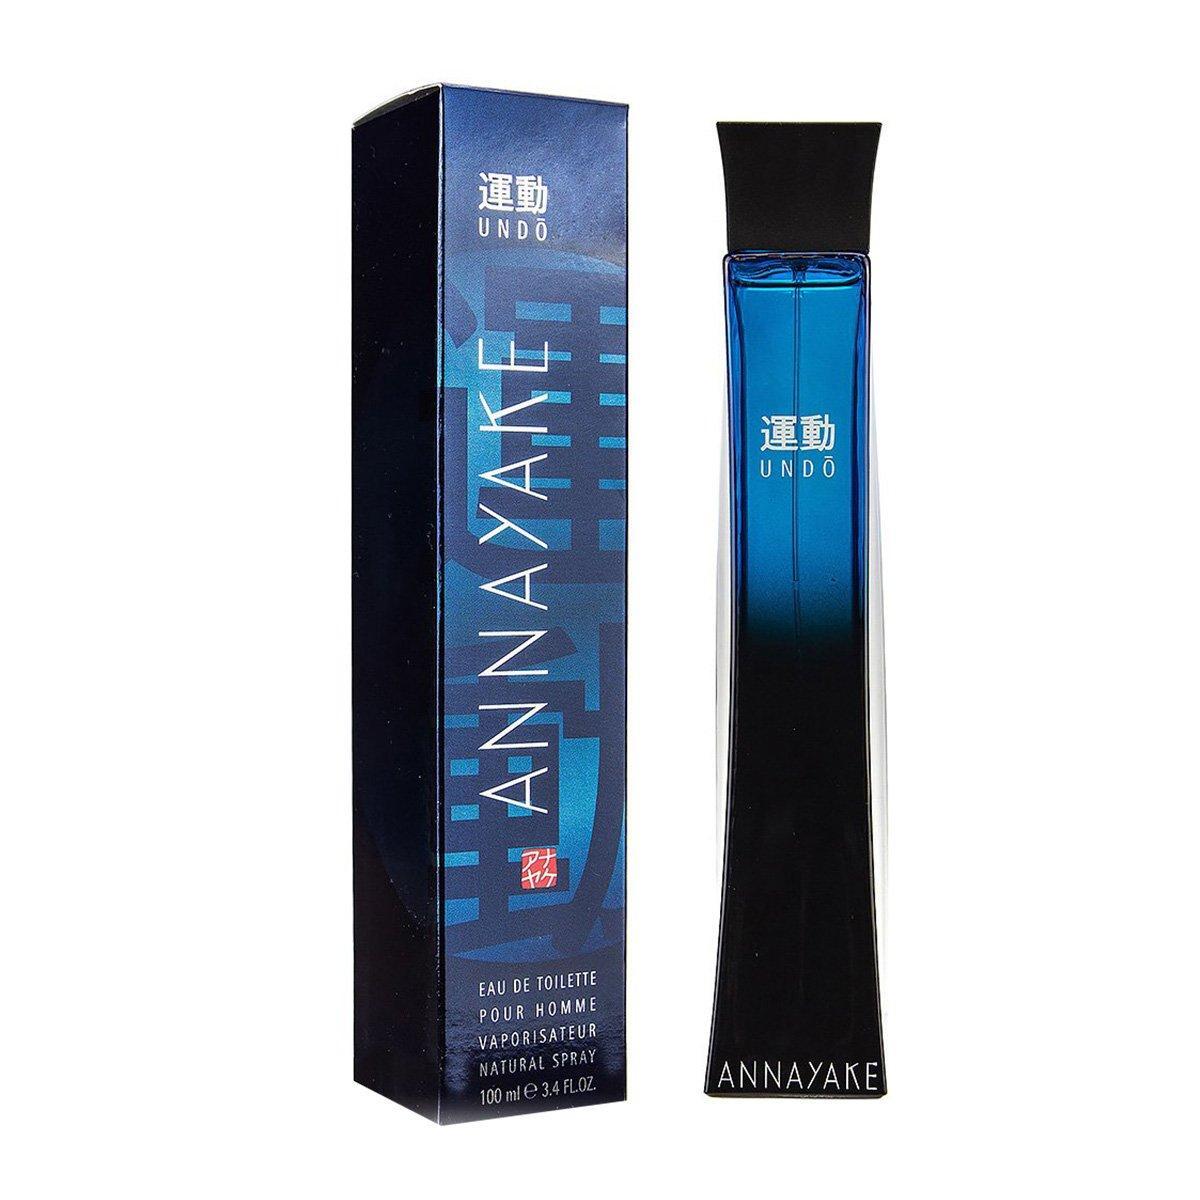 Annayake - Ando, 100 мл, 509 грн